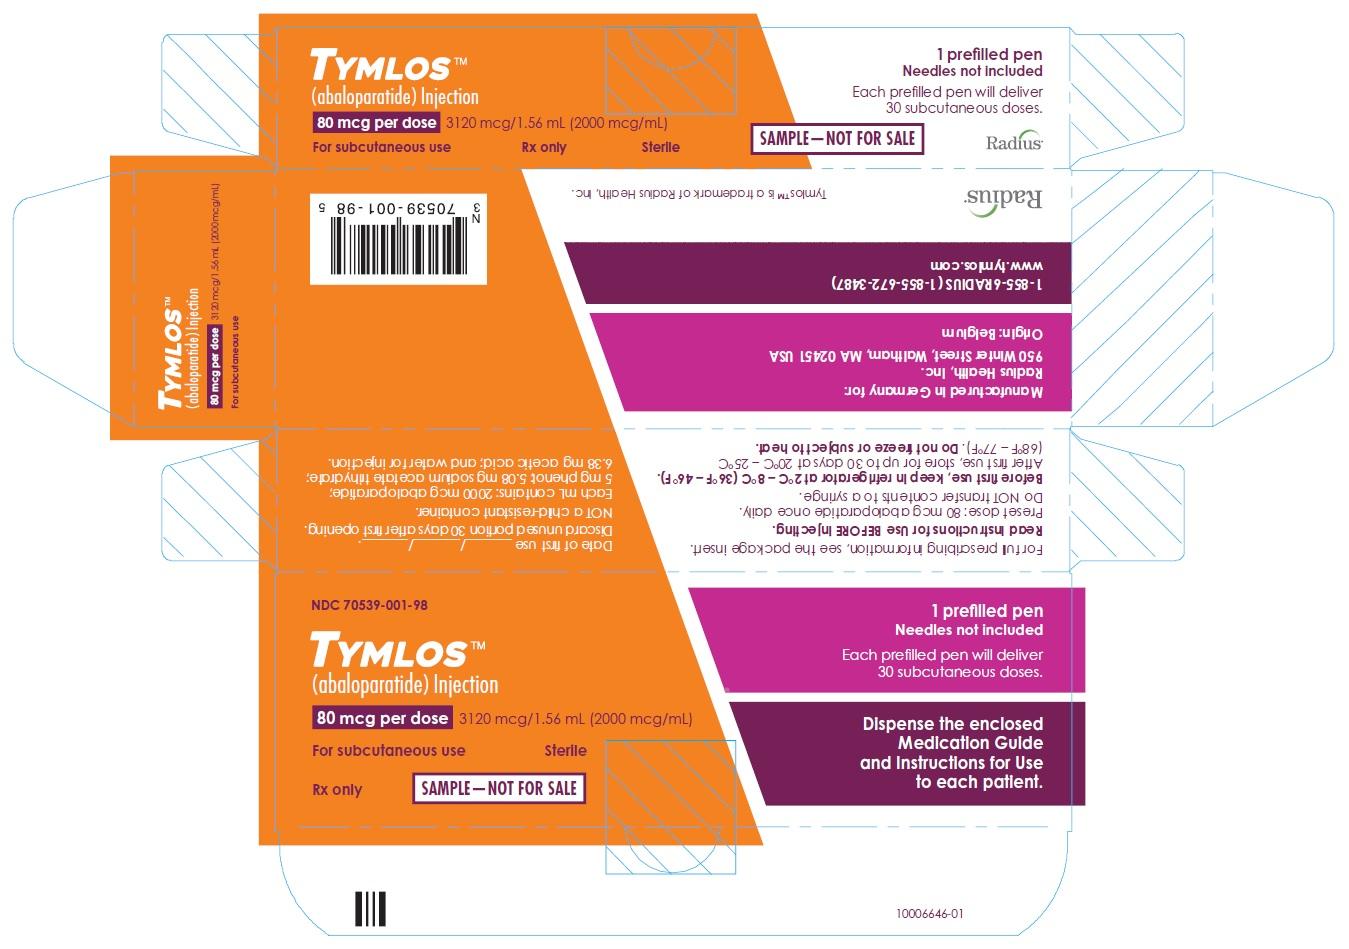 Sample 80 mcg Carton Label